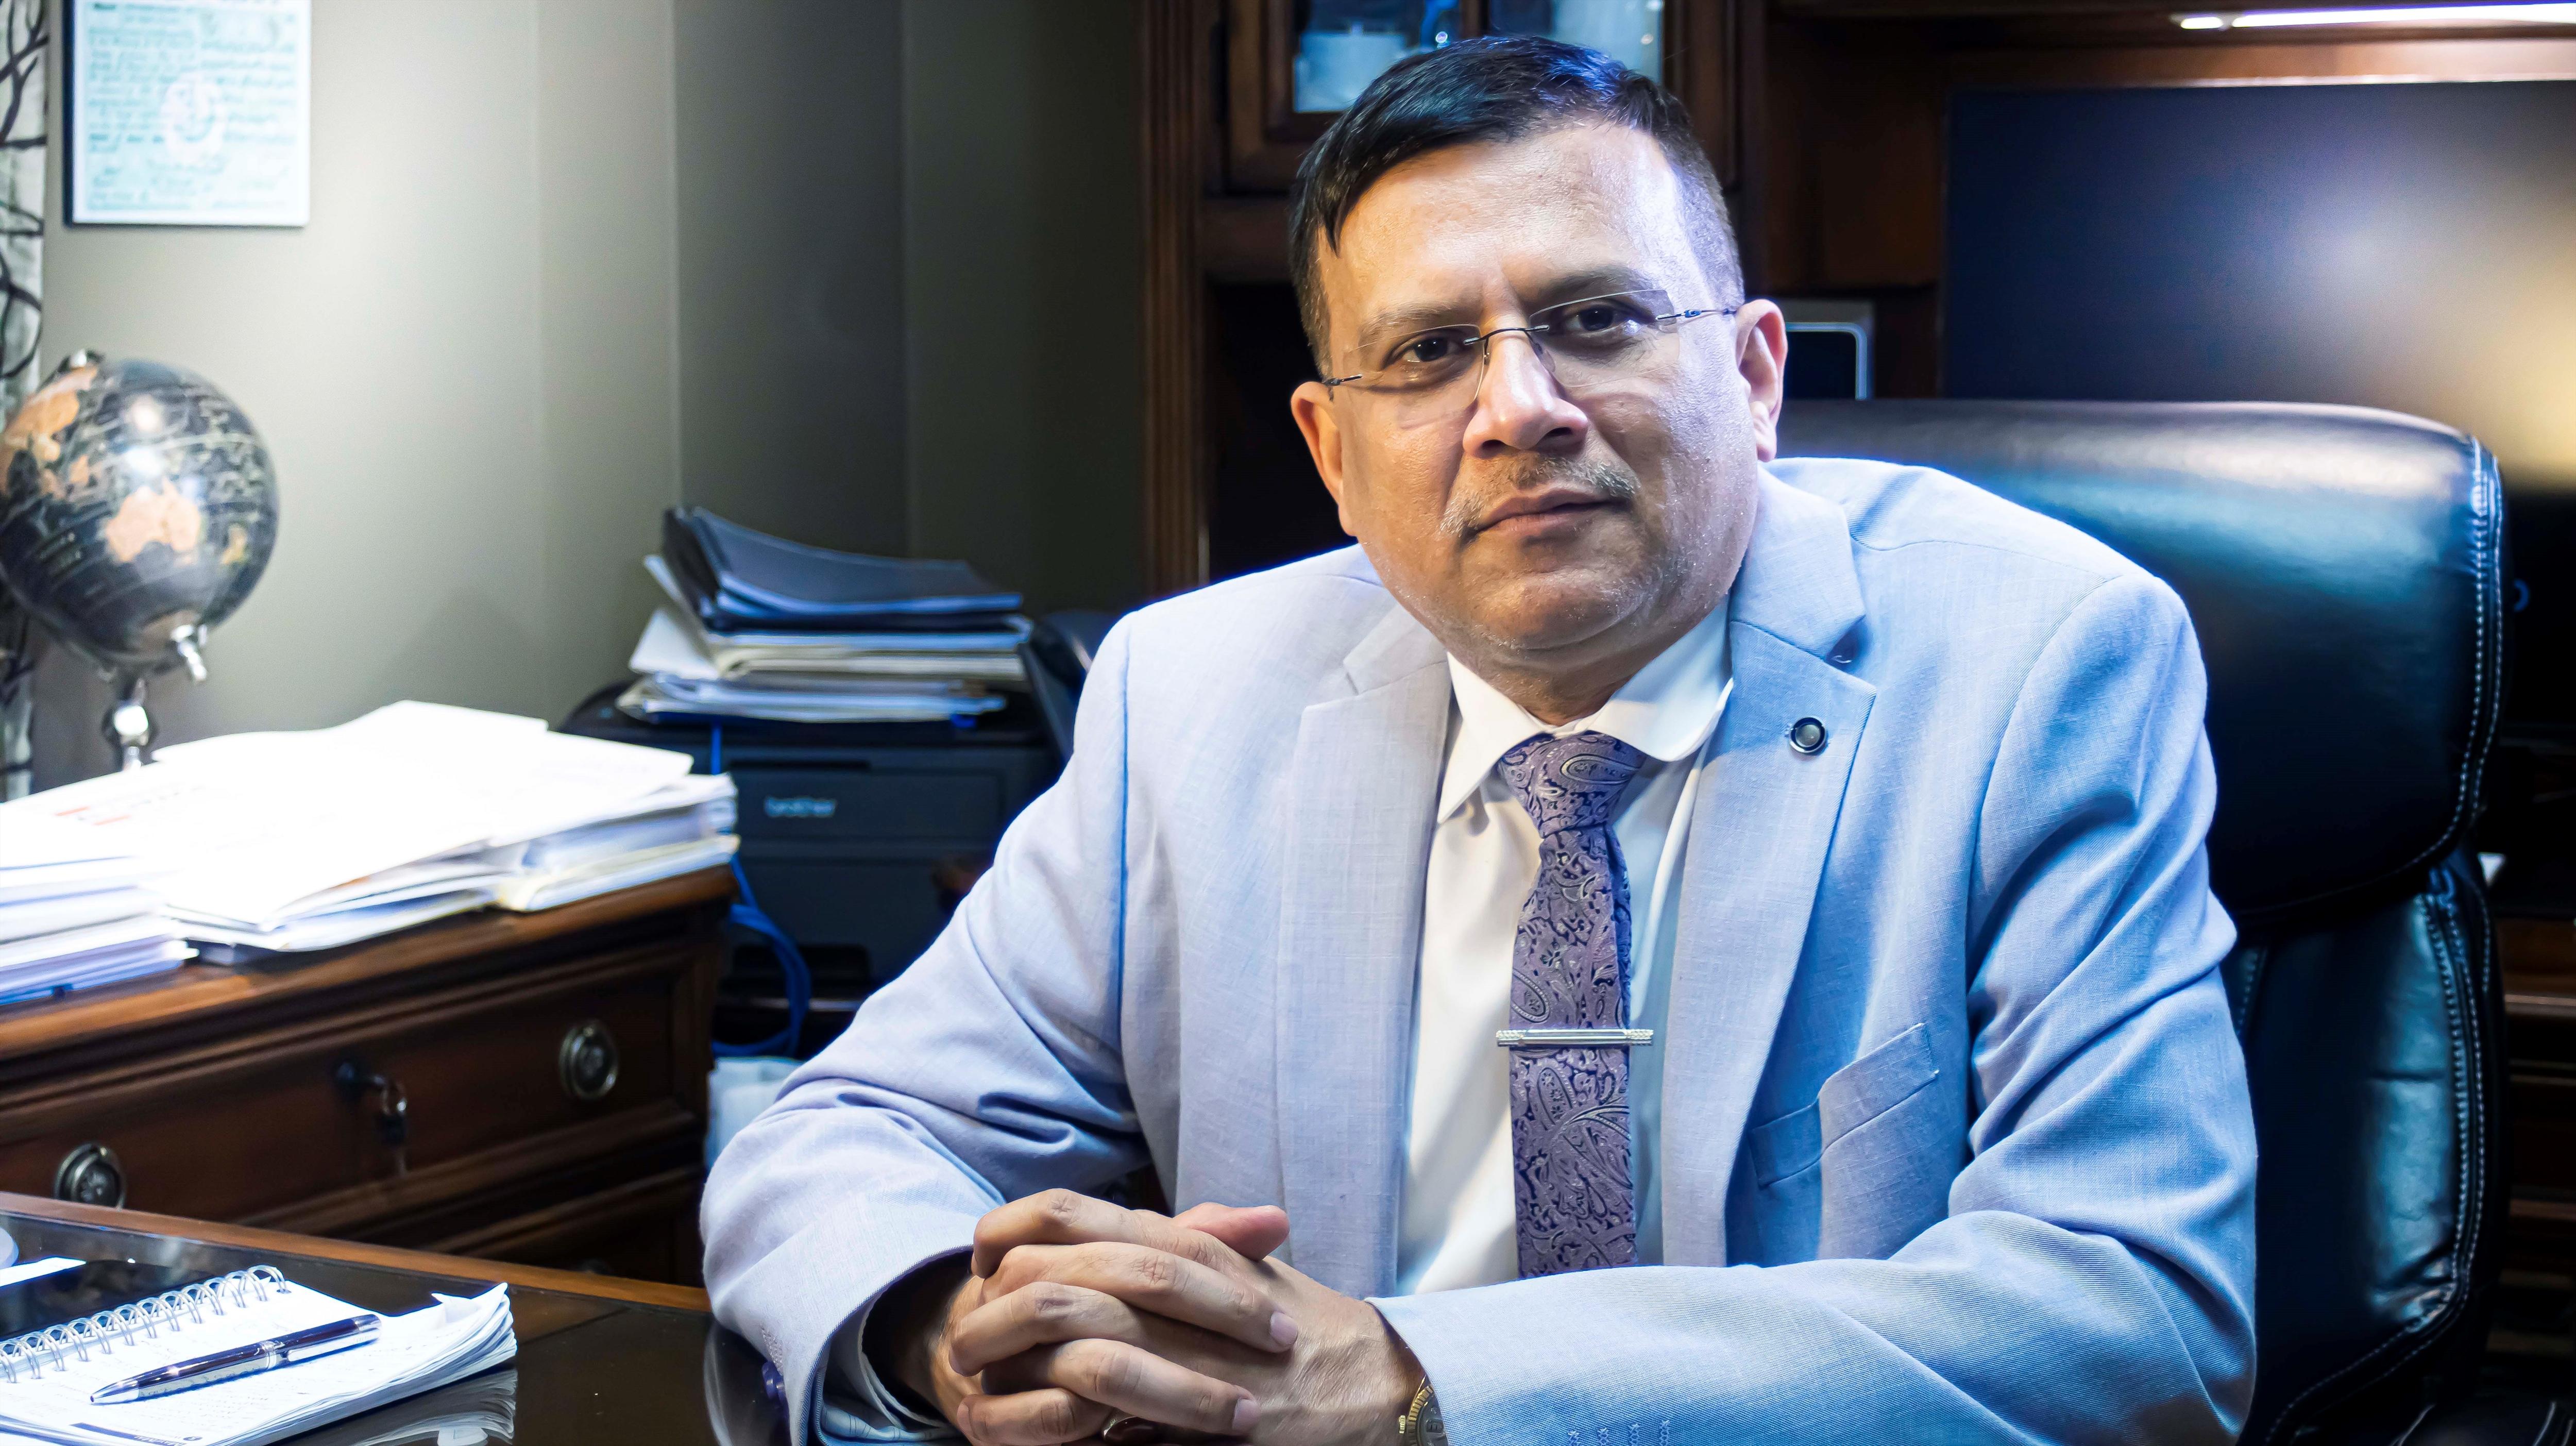 Mr. Syed Mansoor Ali Naqvi